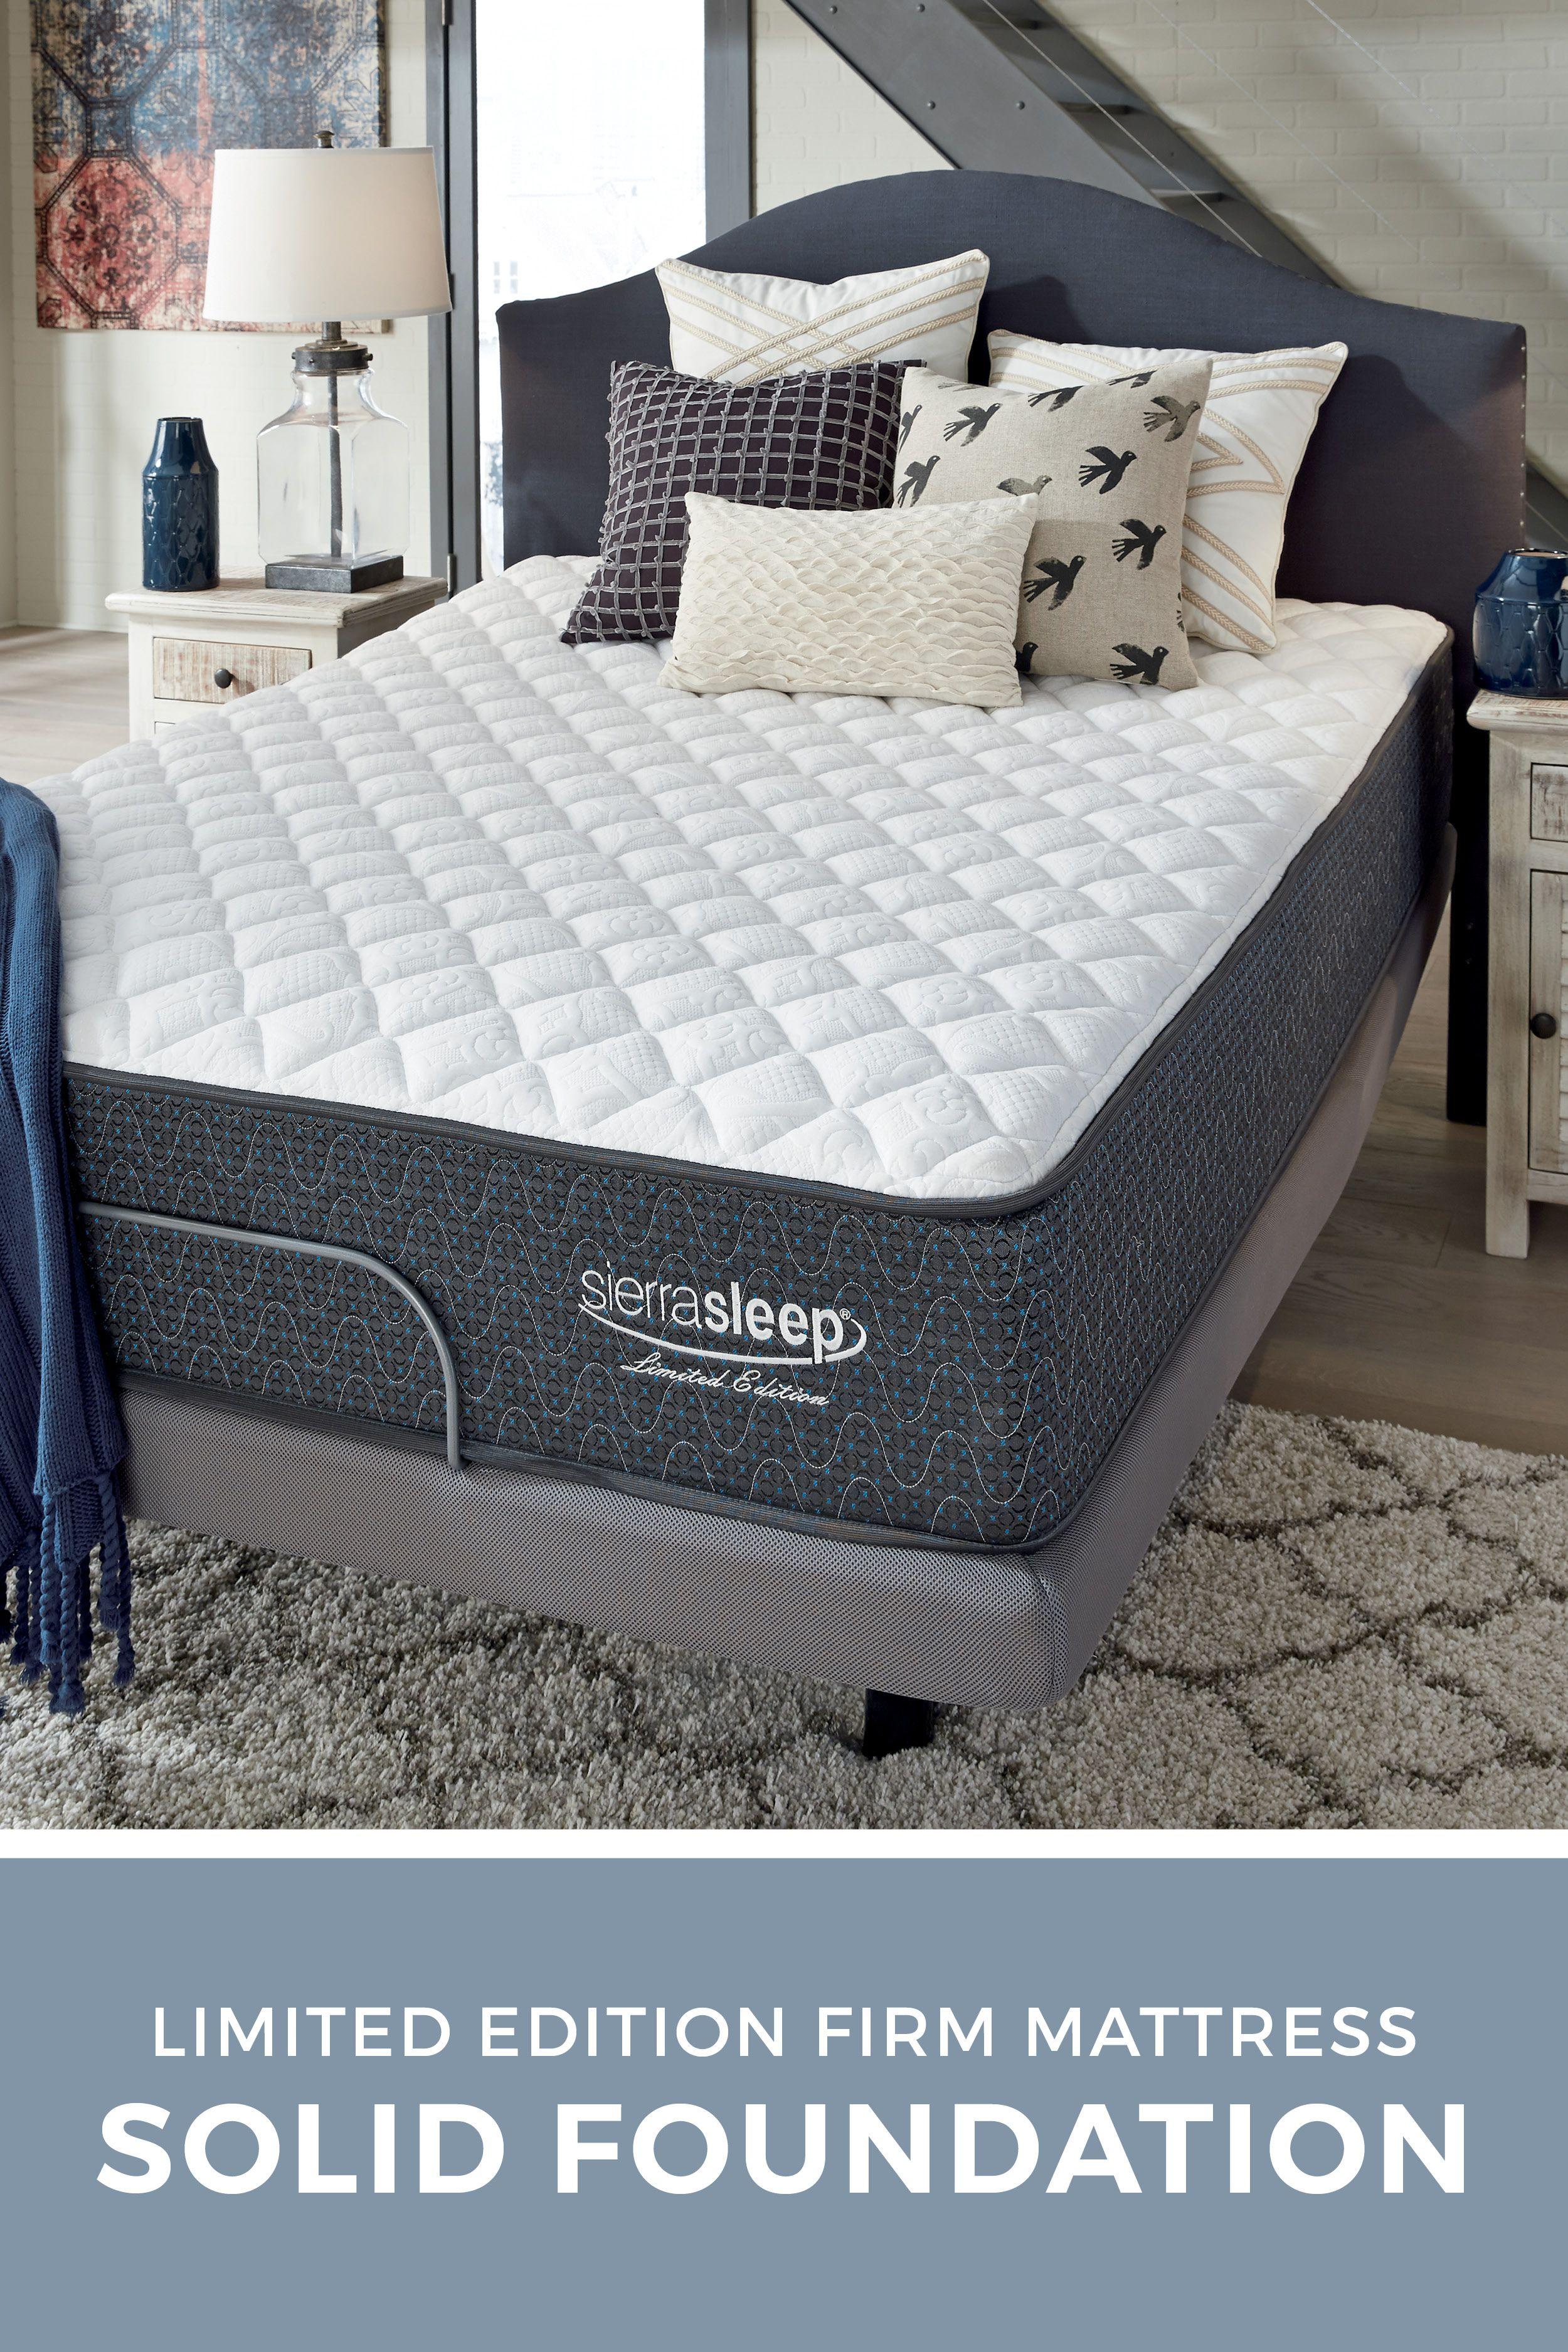 Limited Edition Firm Sierra Sleep Mattress By Ashley Furniture